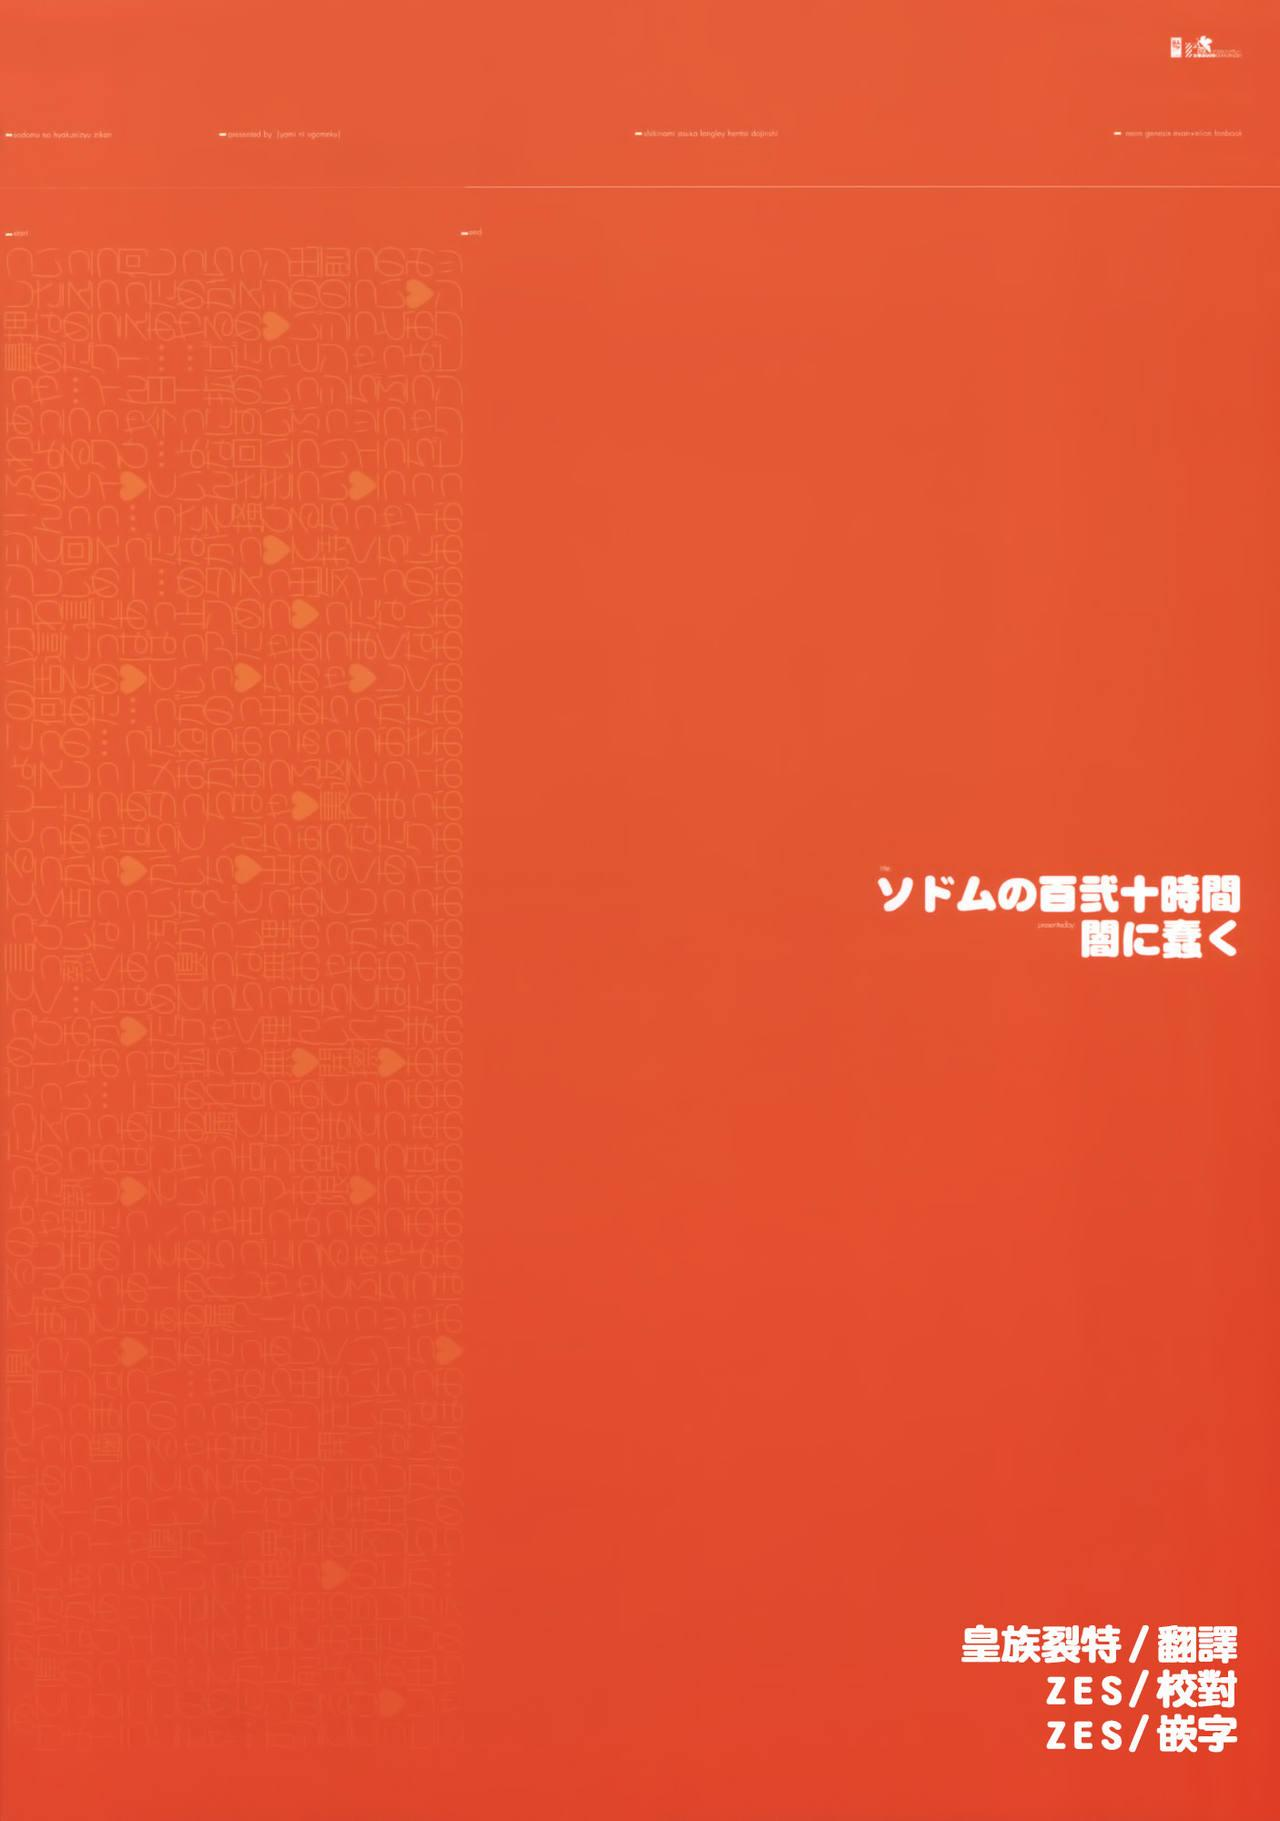 Sodom no Hyakunijyuu Jikan + Paper 25